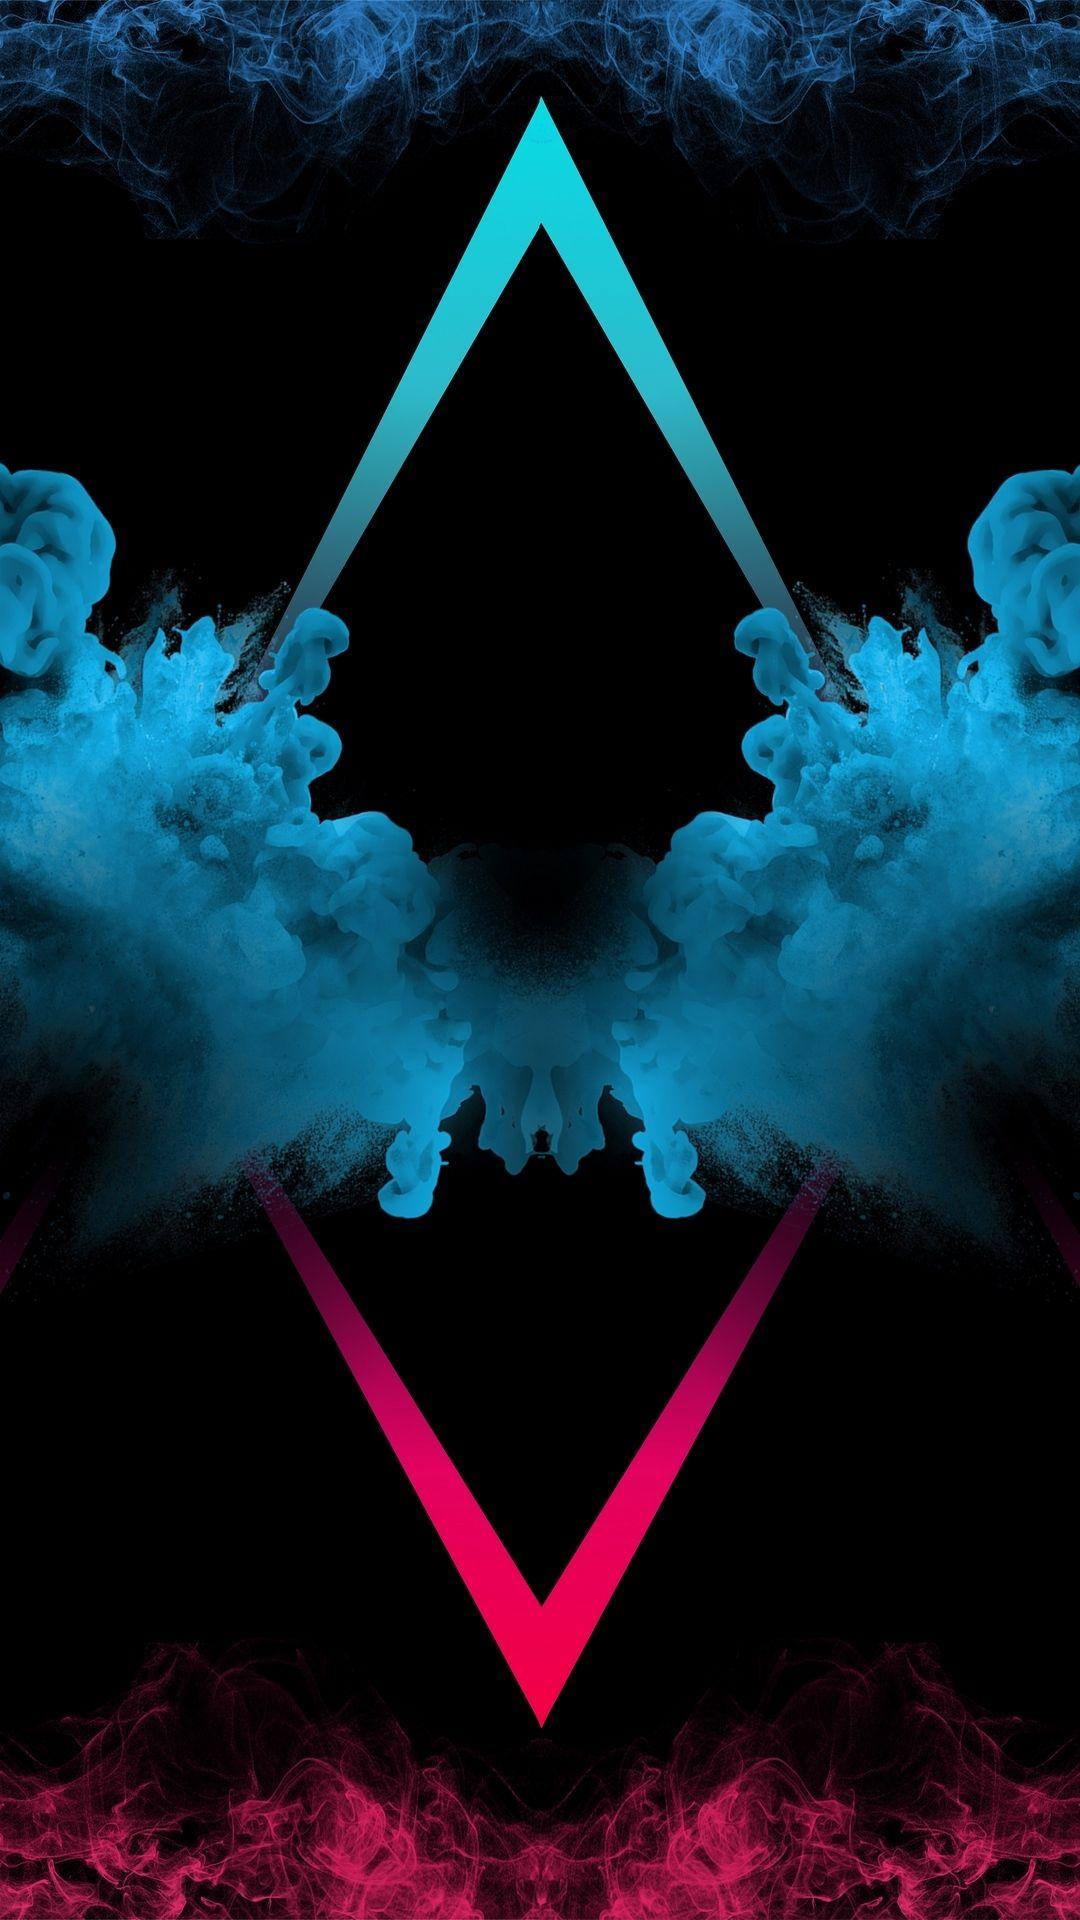 Black Smoke Wallpaper In 2020 Smoke Wallpaper Poster Background Design Neon Wallpaper